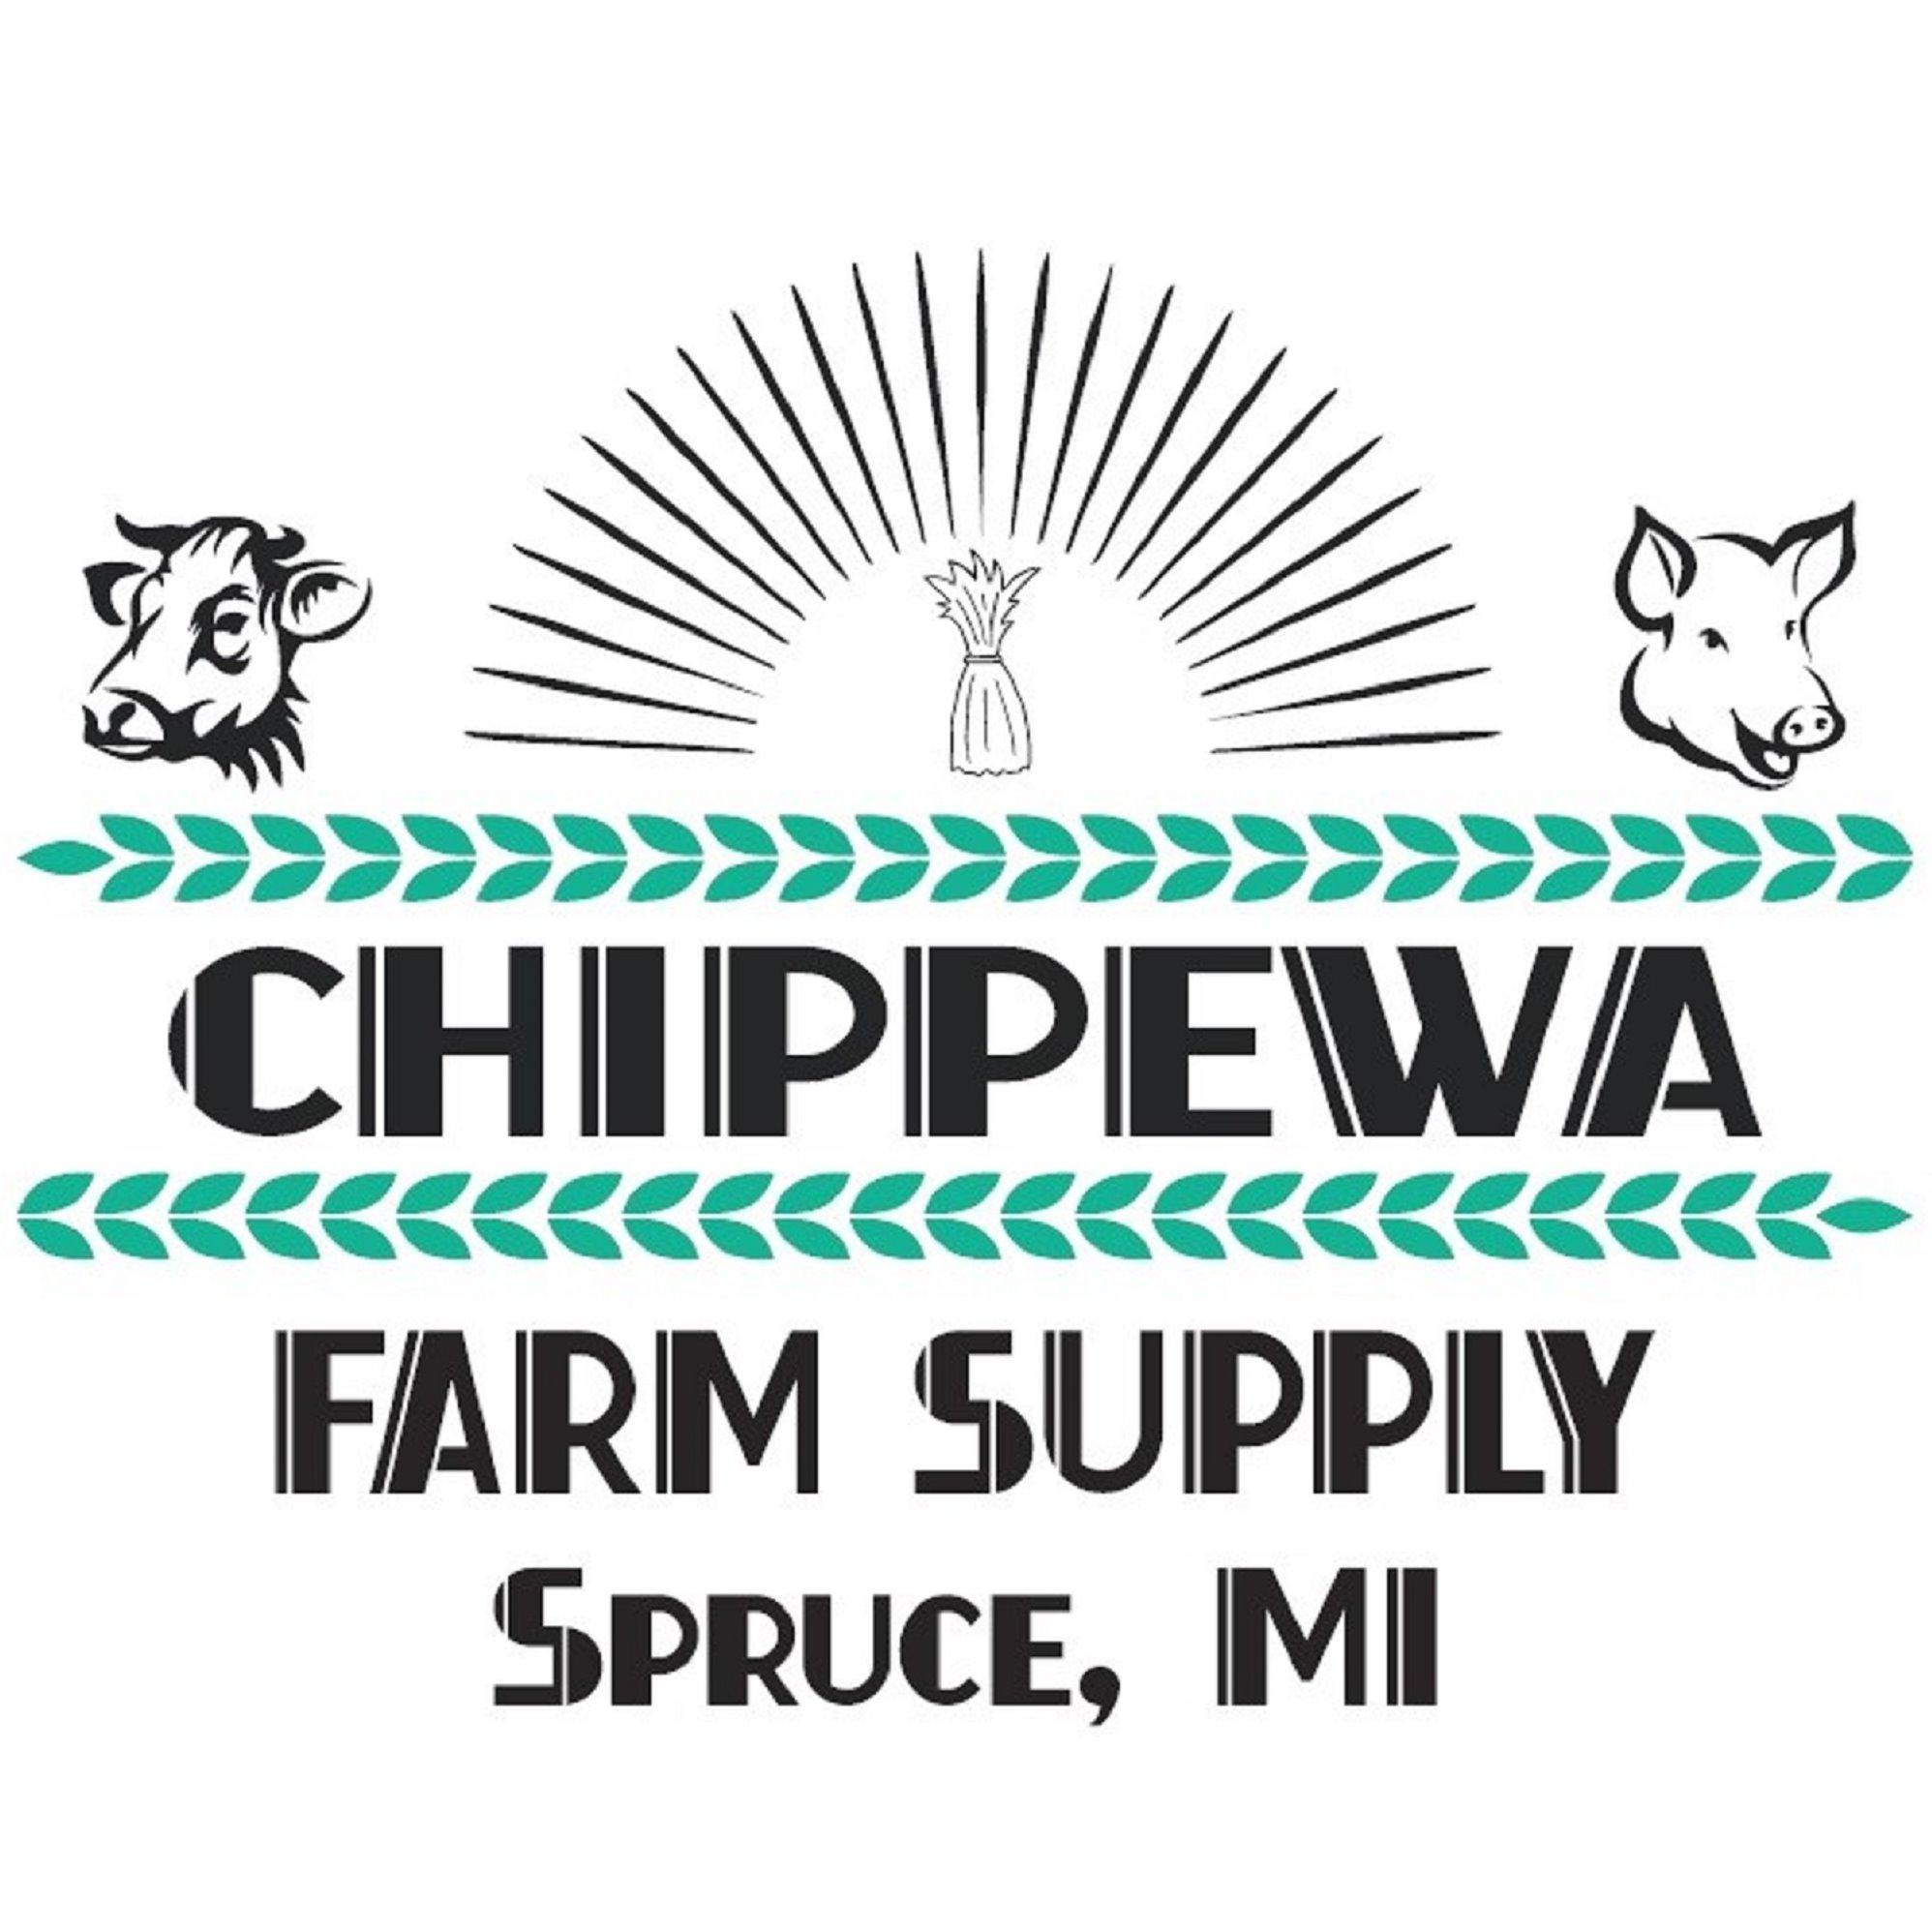 Chippewa Farm Supply, LLC image 2